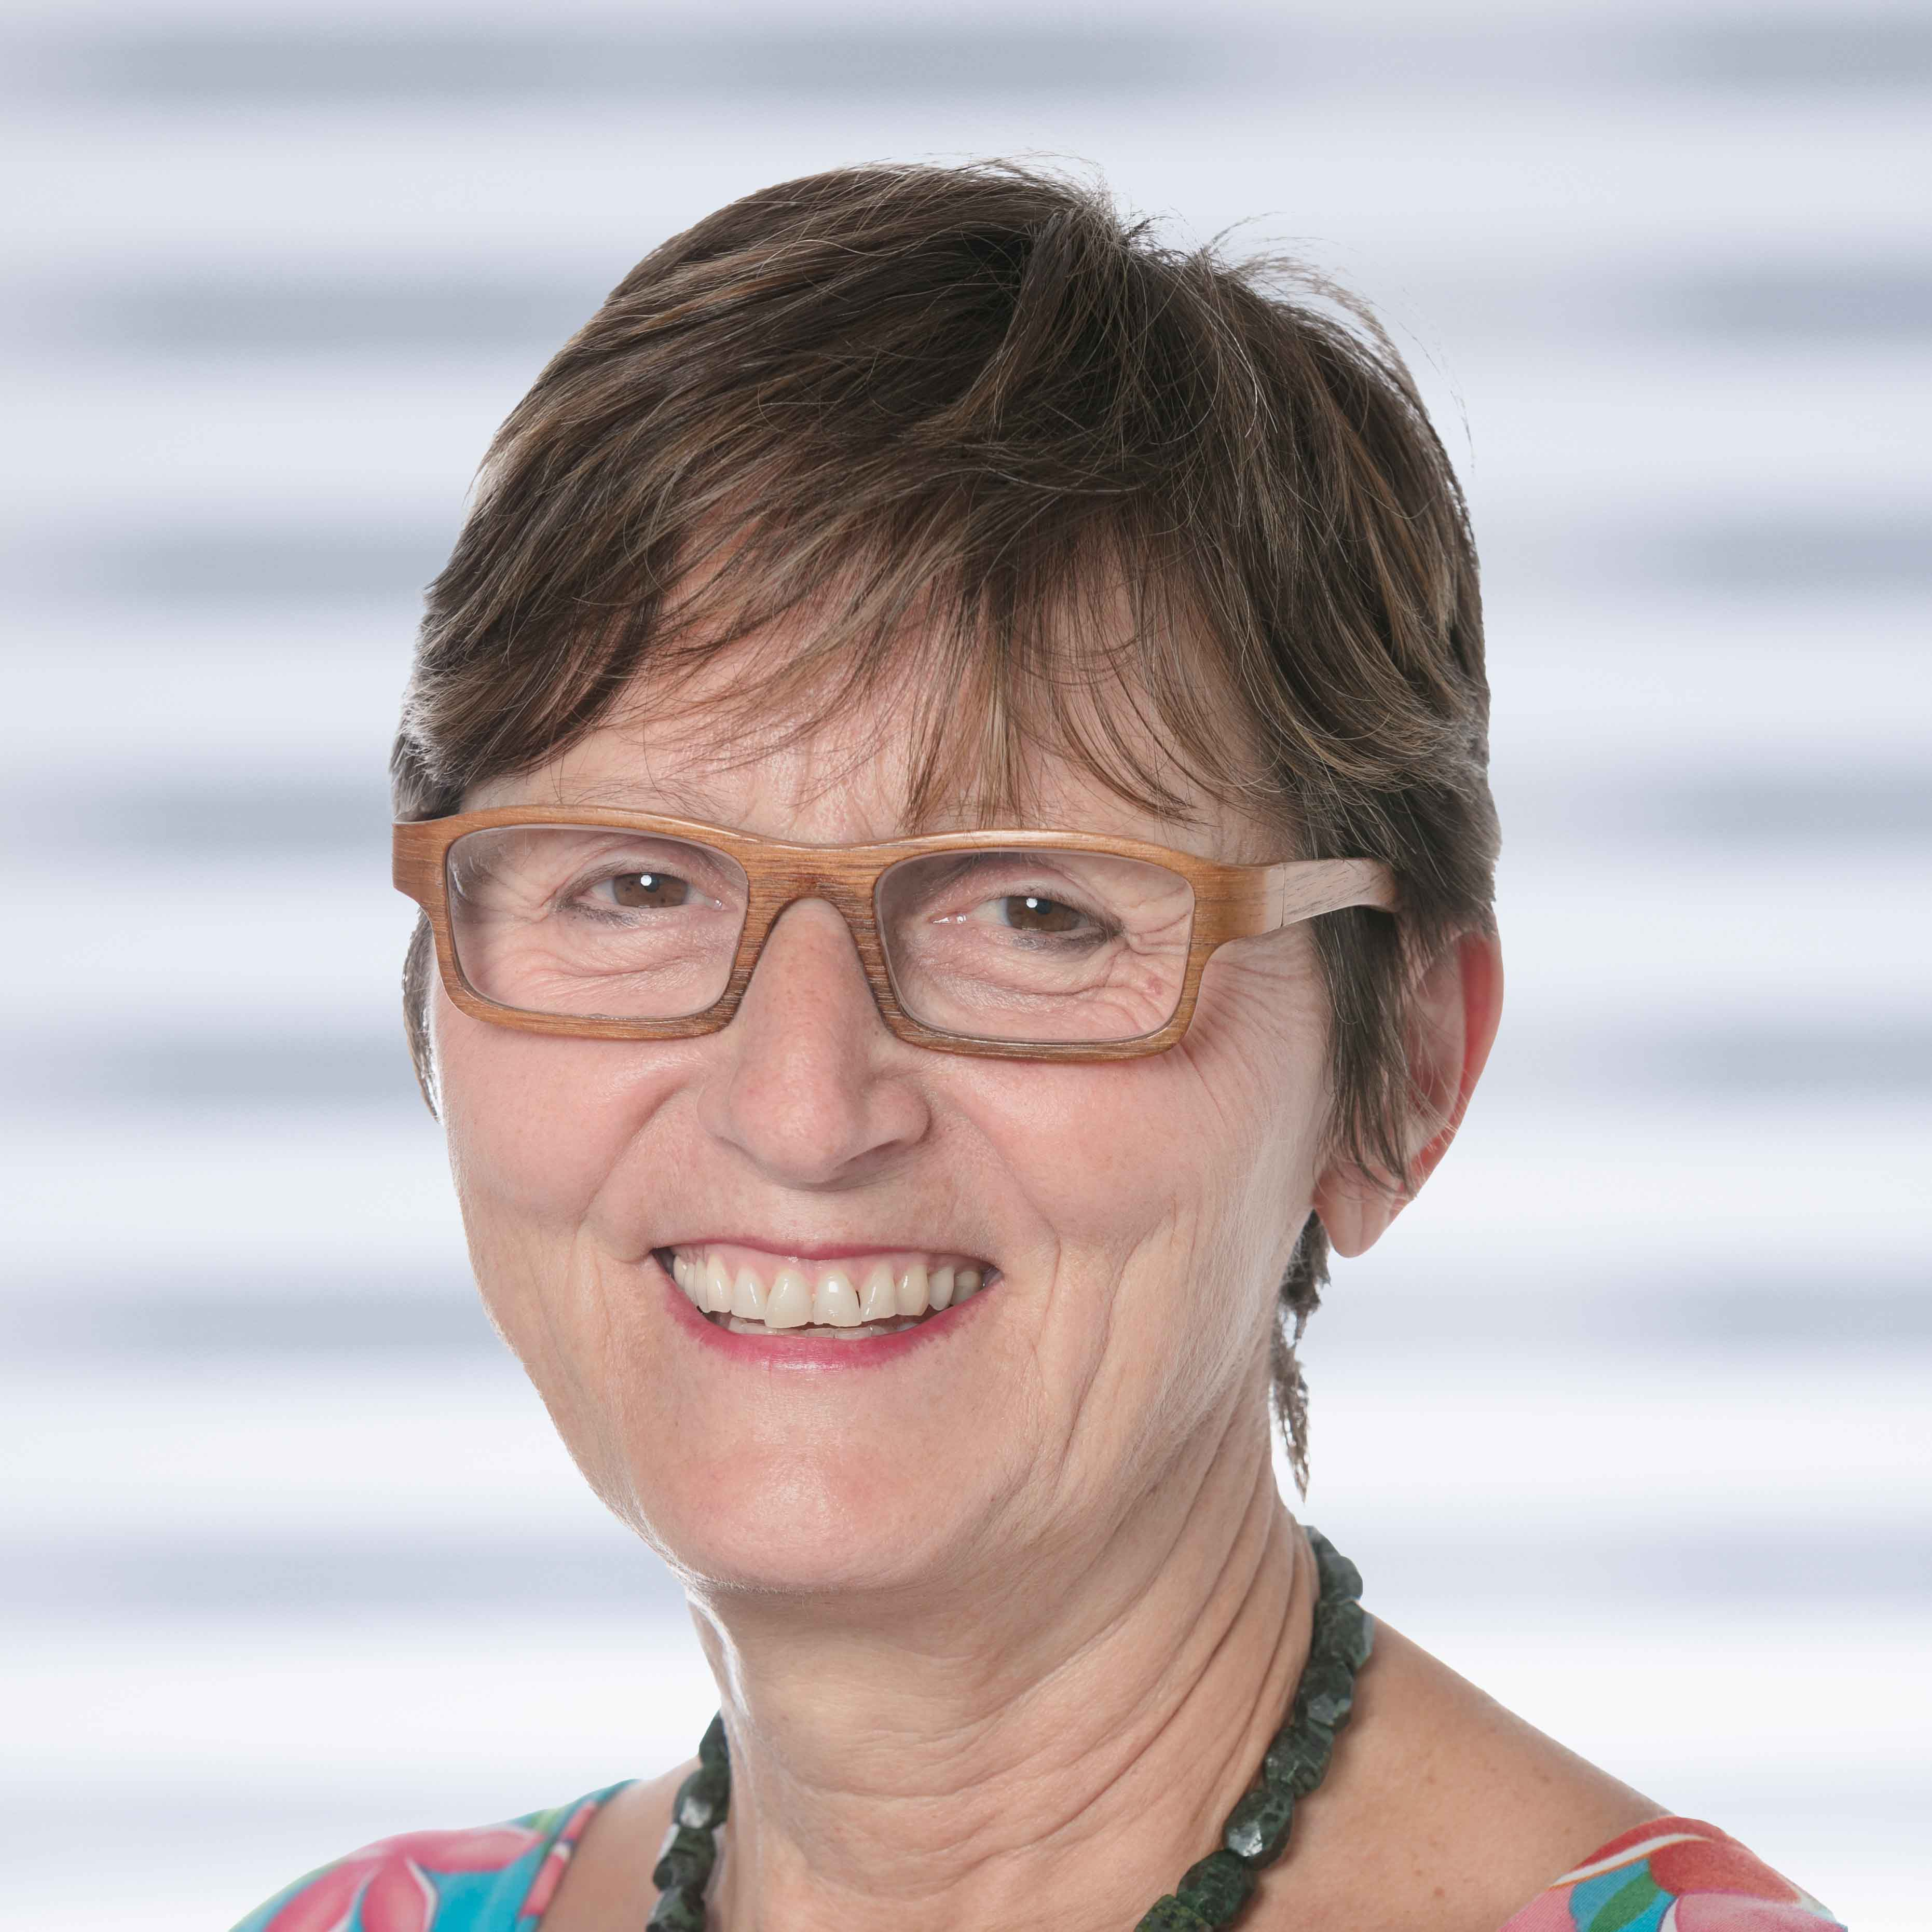 Marianne Götte